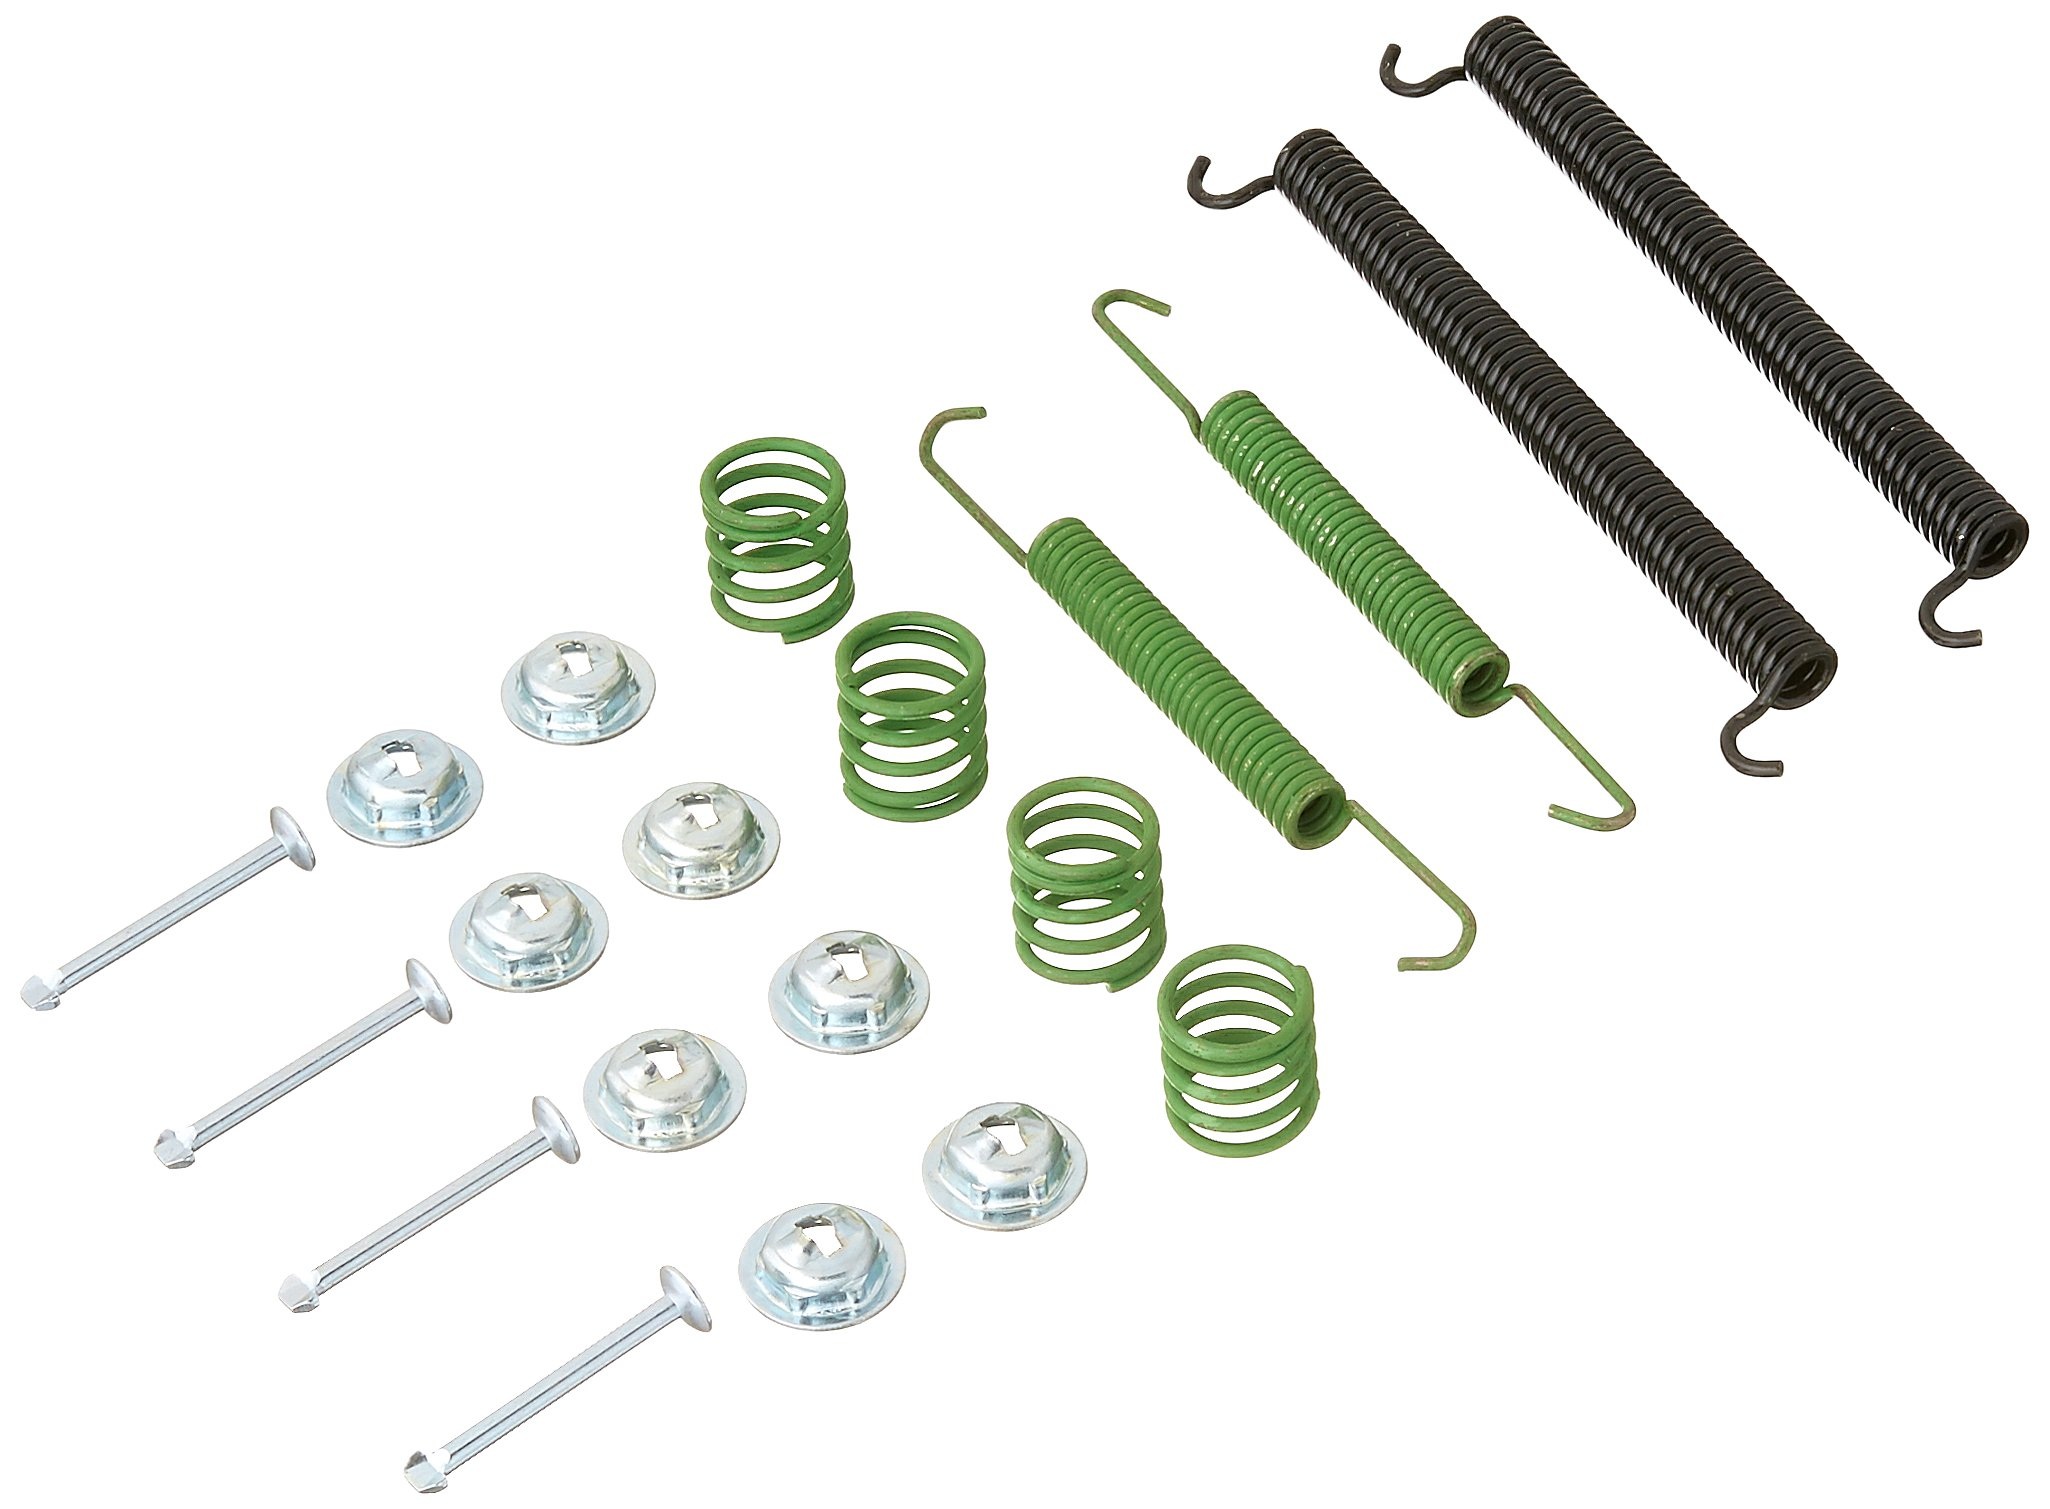 Carlson Quality Brake Parts 17185 Brake Combination Kit by Carlson